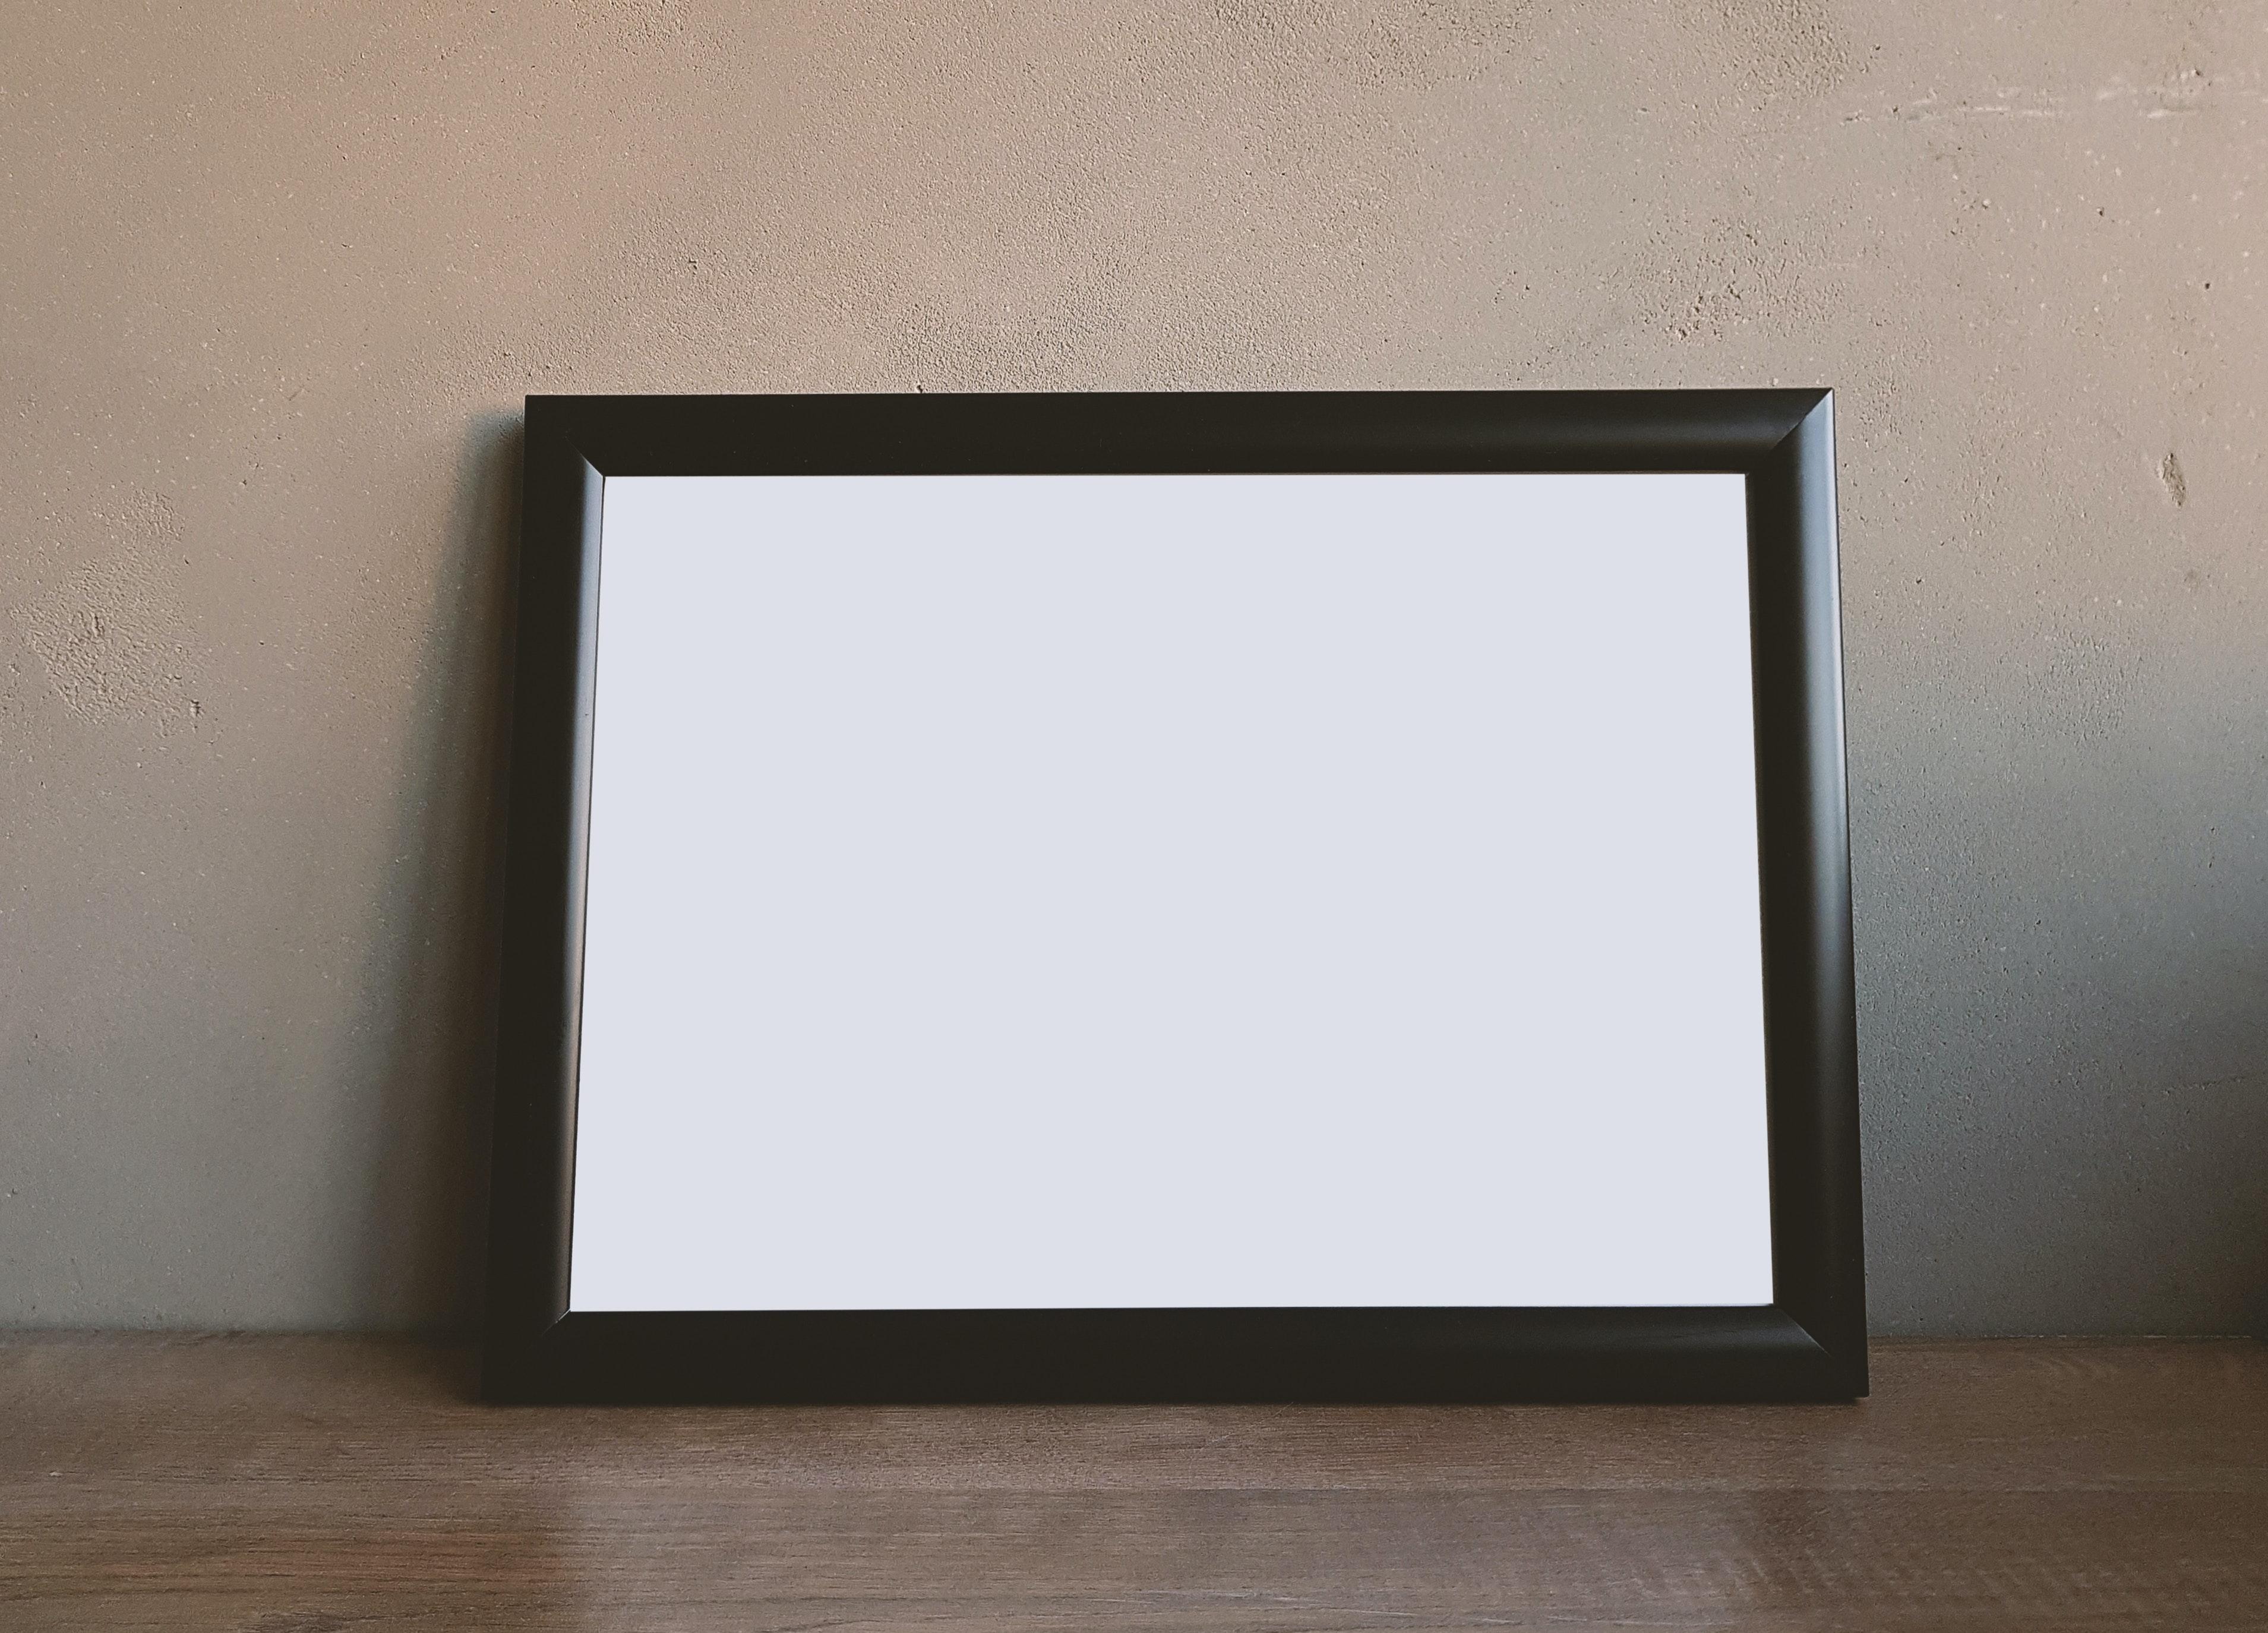 Brown Wooden Rectangular Photo Frame · Free Stock Photo